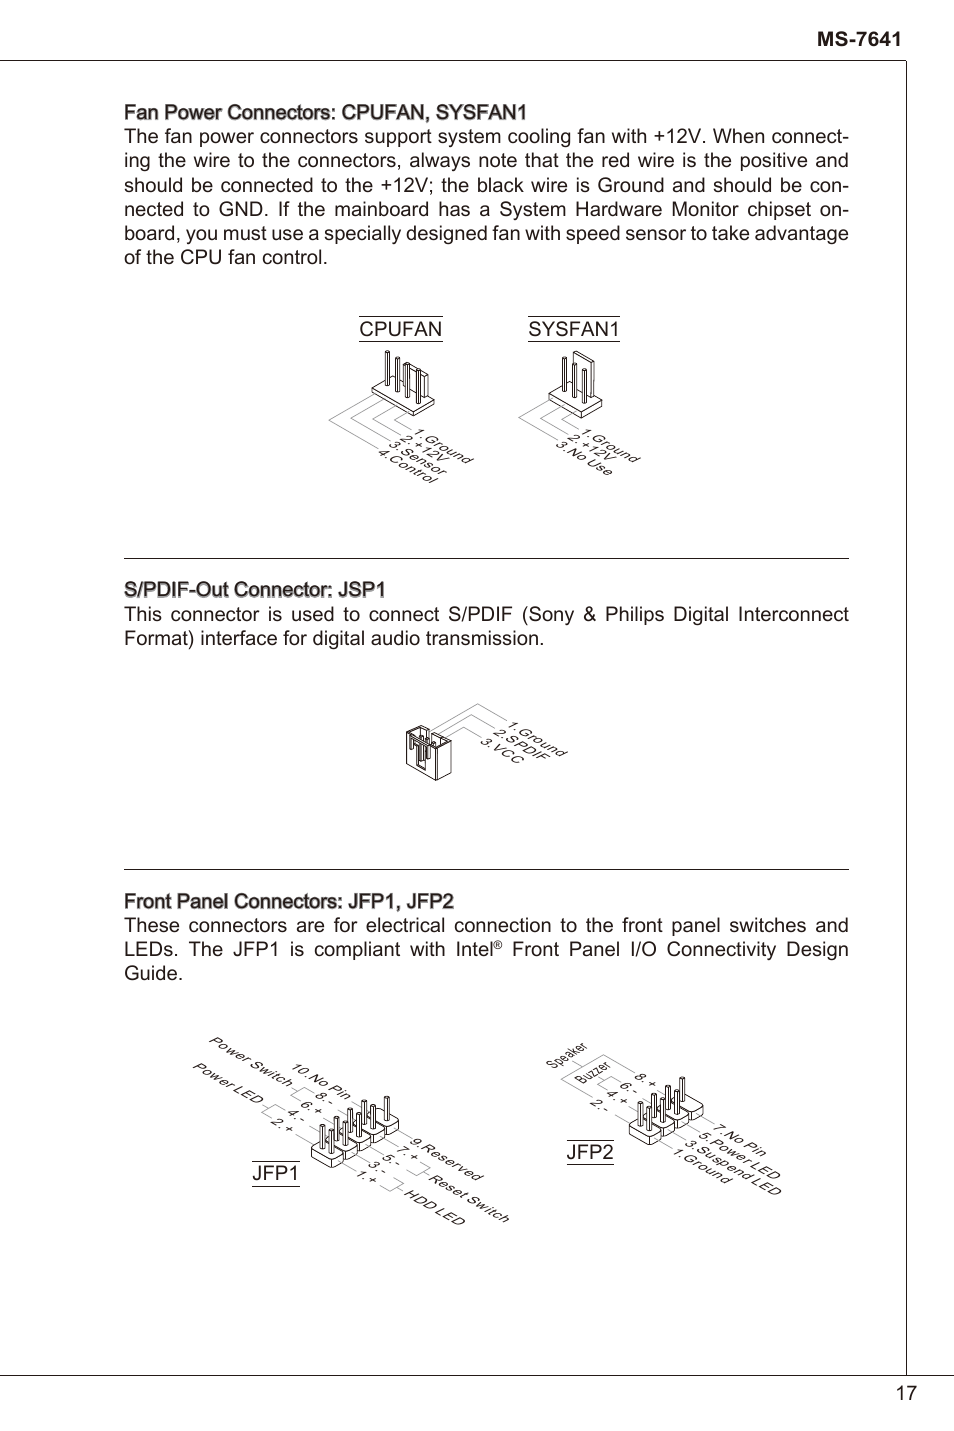 Front panel io connectivity design guide jfp2 msi 880gma e35 fx front panel io connectivity design guide jfp2 msi 880gma e35 solutioingenieria Images